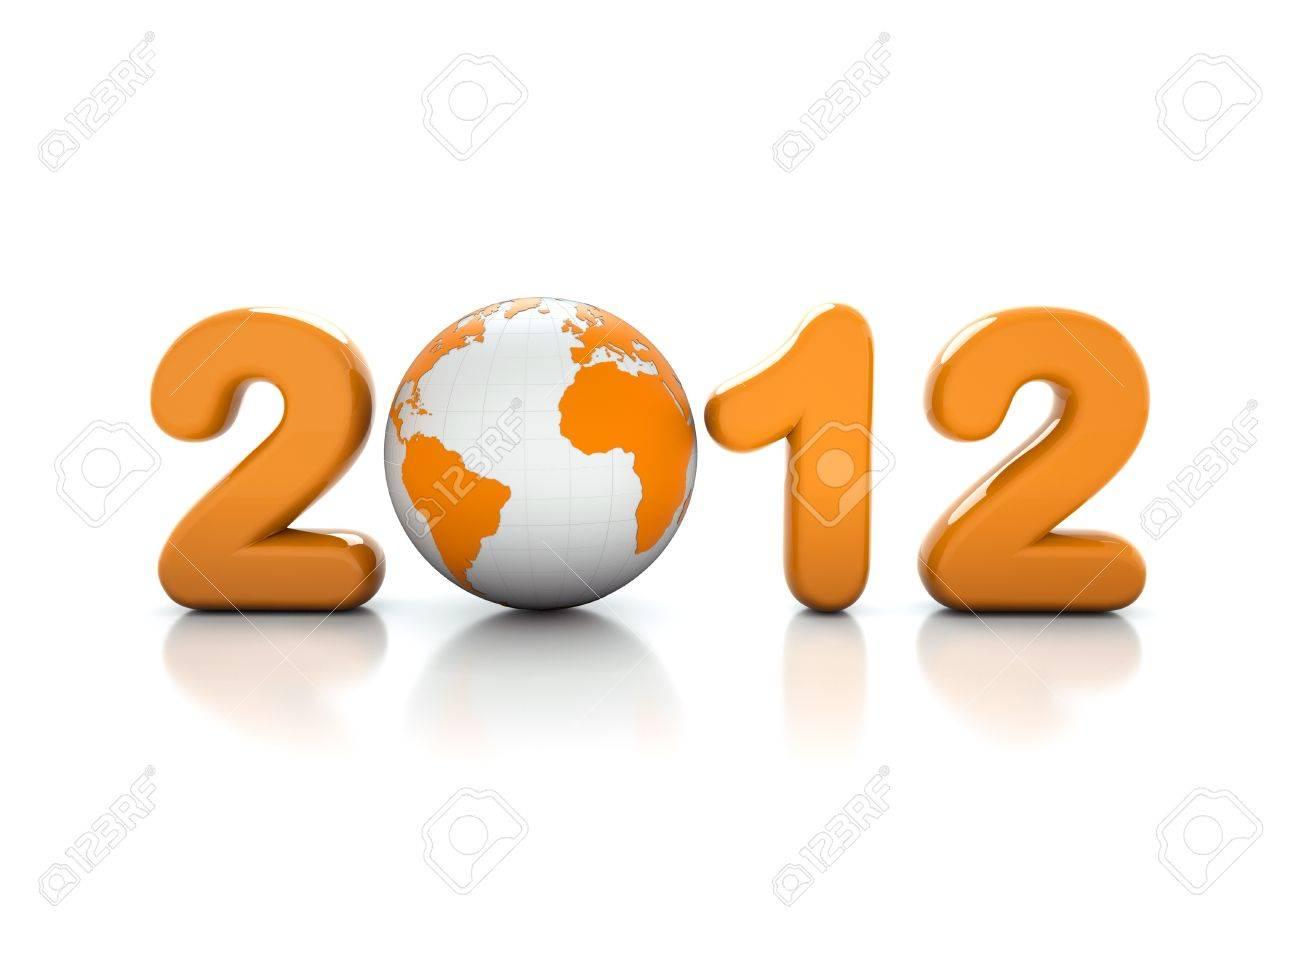 New year 2012 - 3d Illustration - Stock Illustration - 11568057